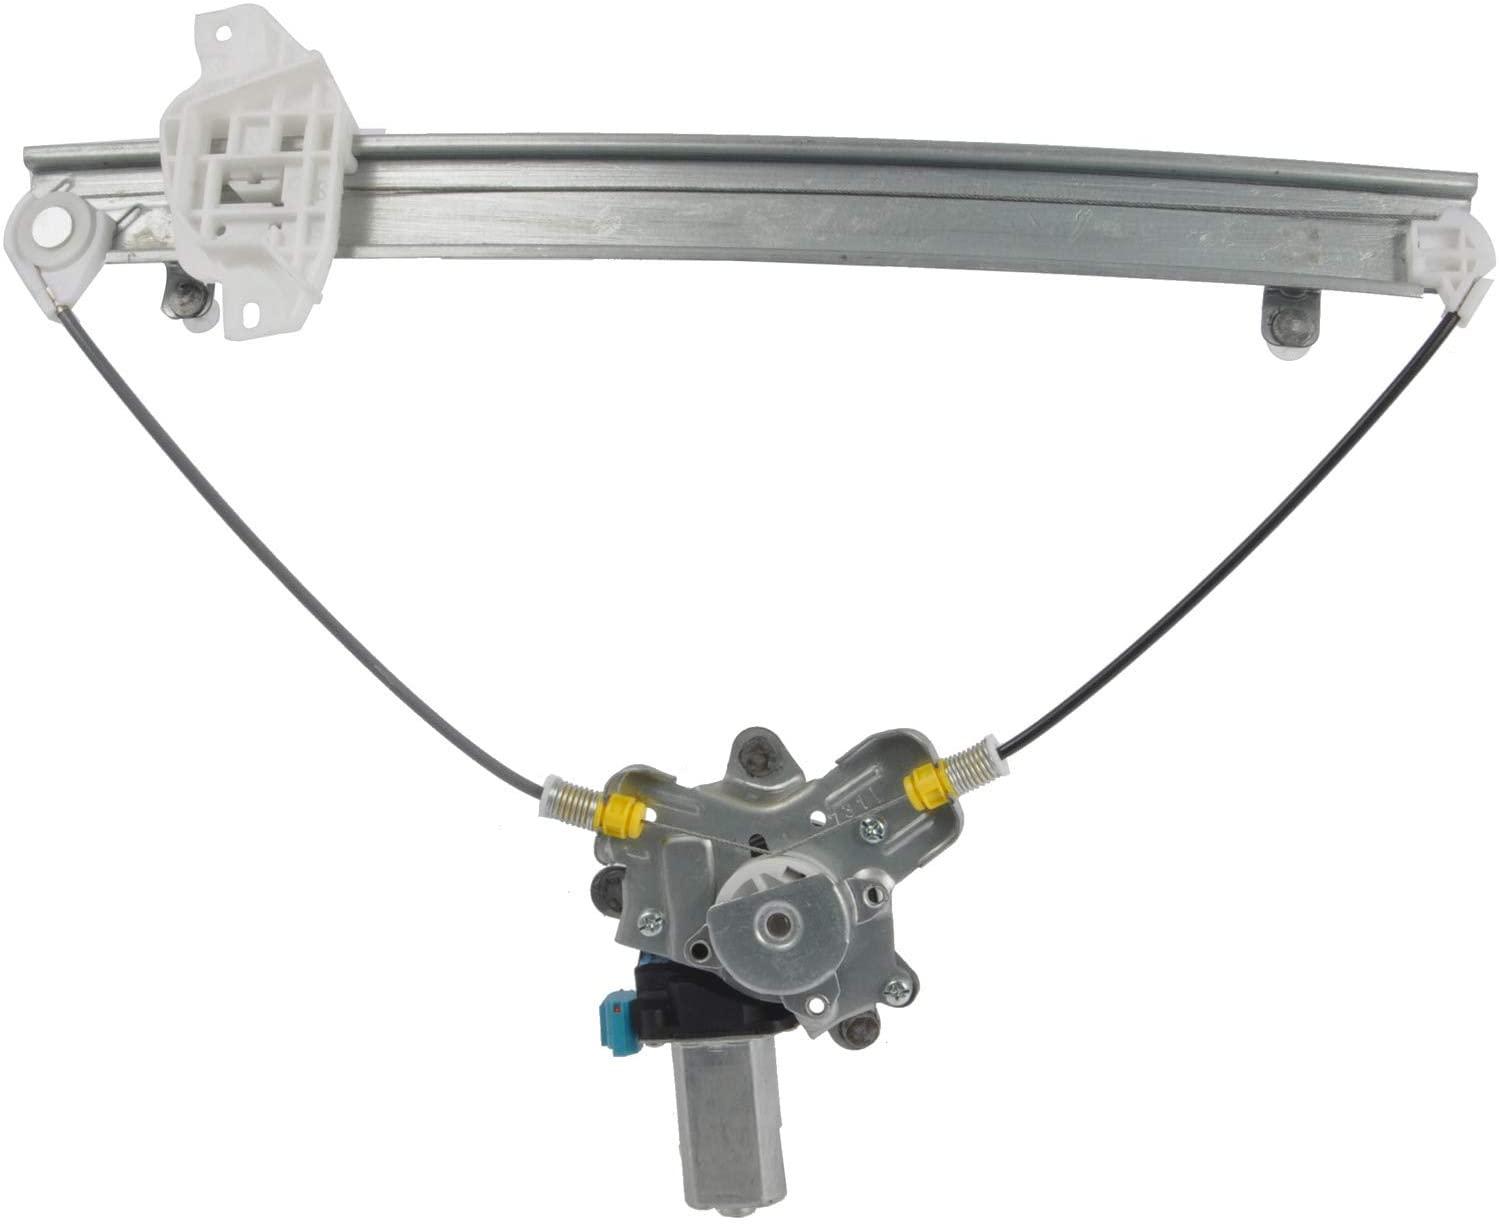 Cardone Select 82-4504GR New Window Lift Motor